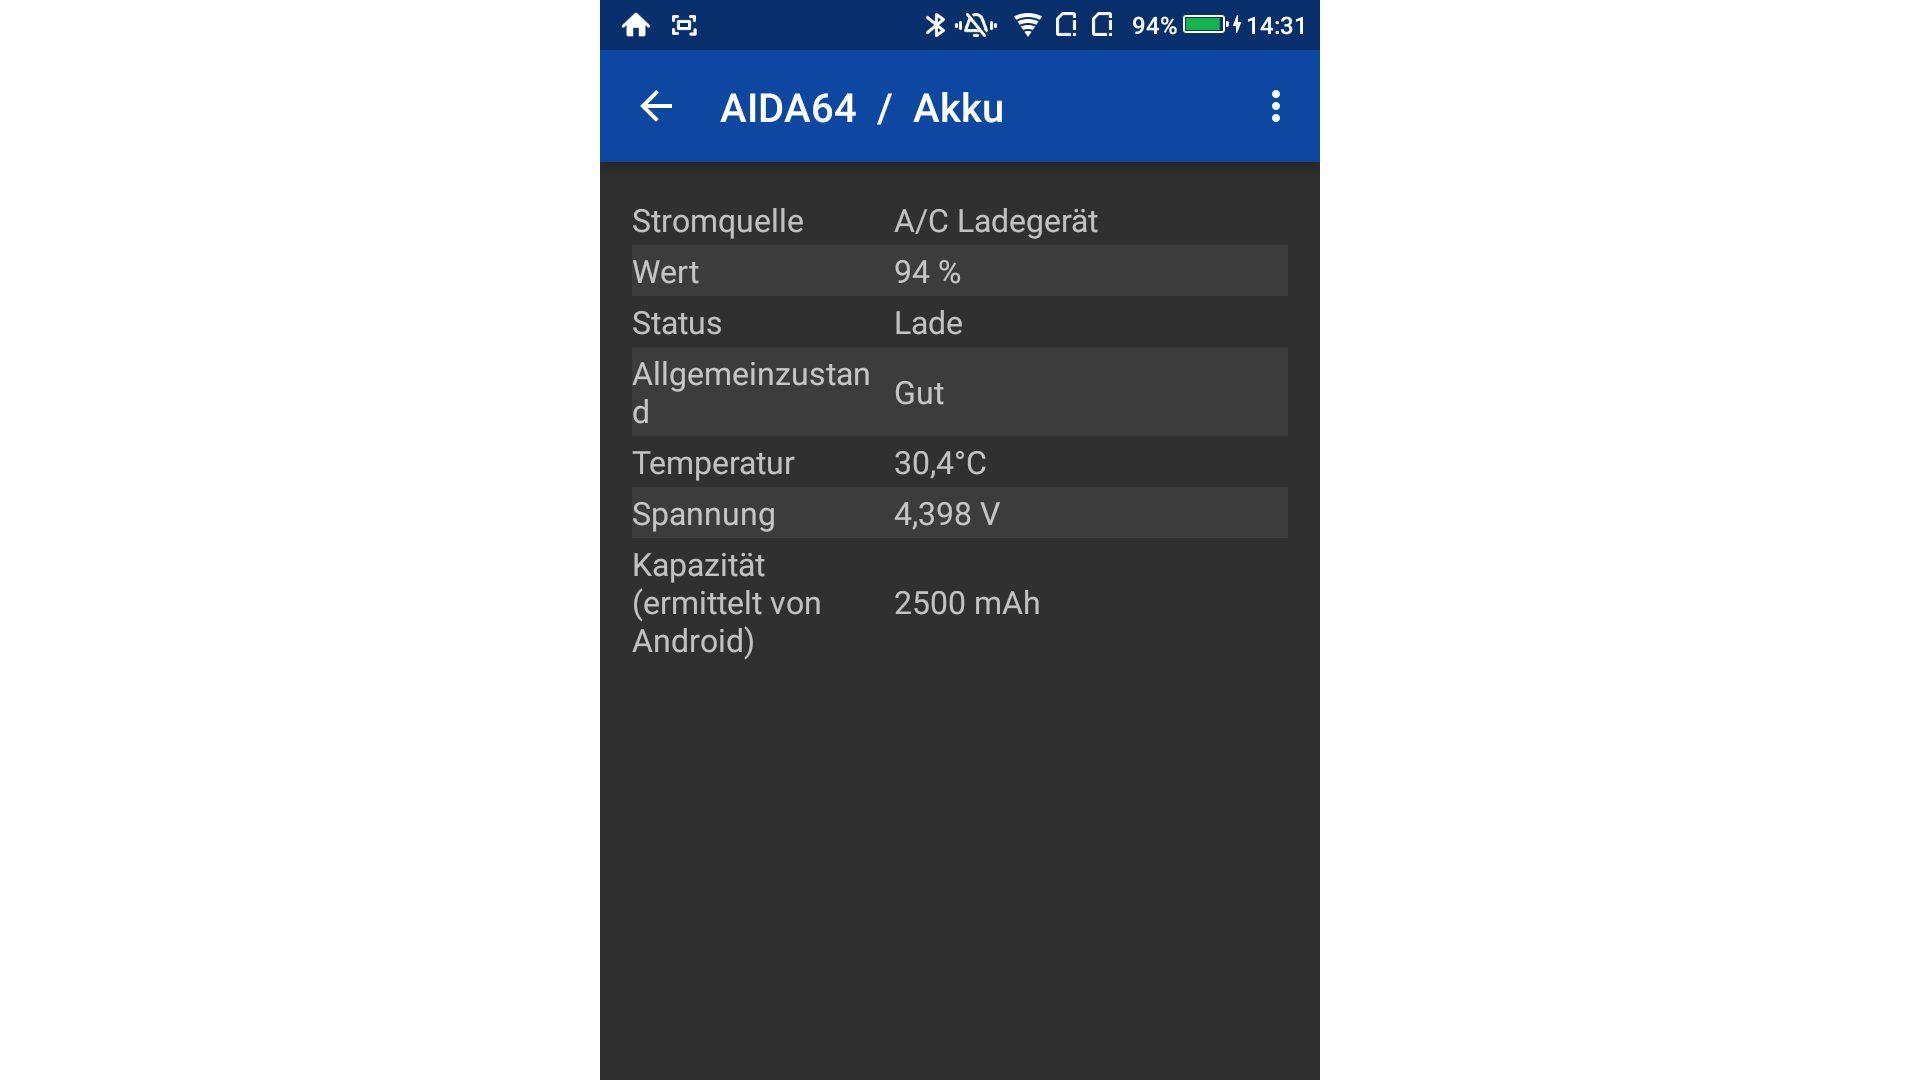 Coolpad-Torino-AIDA64-Akku